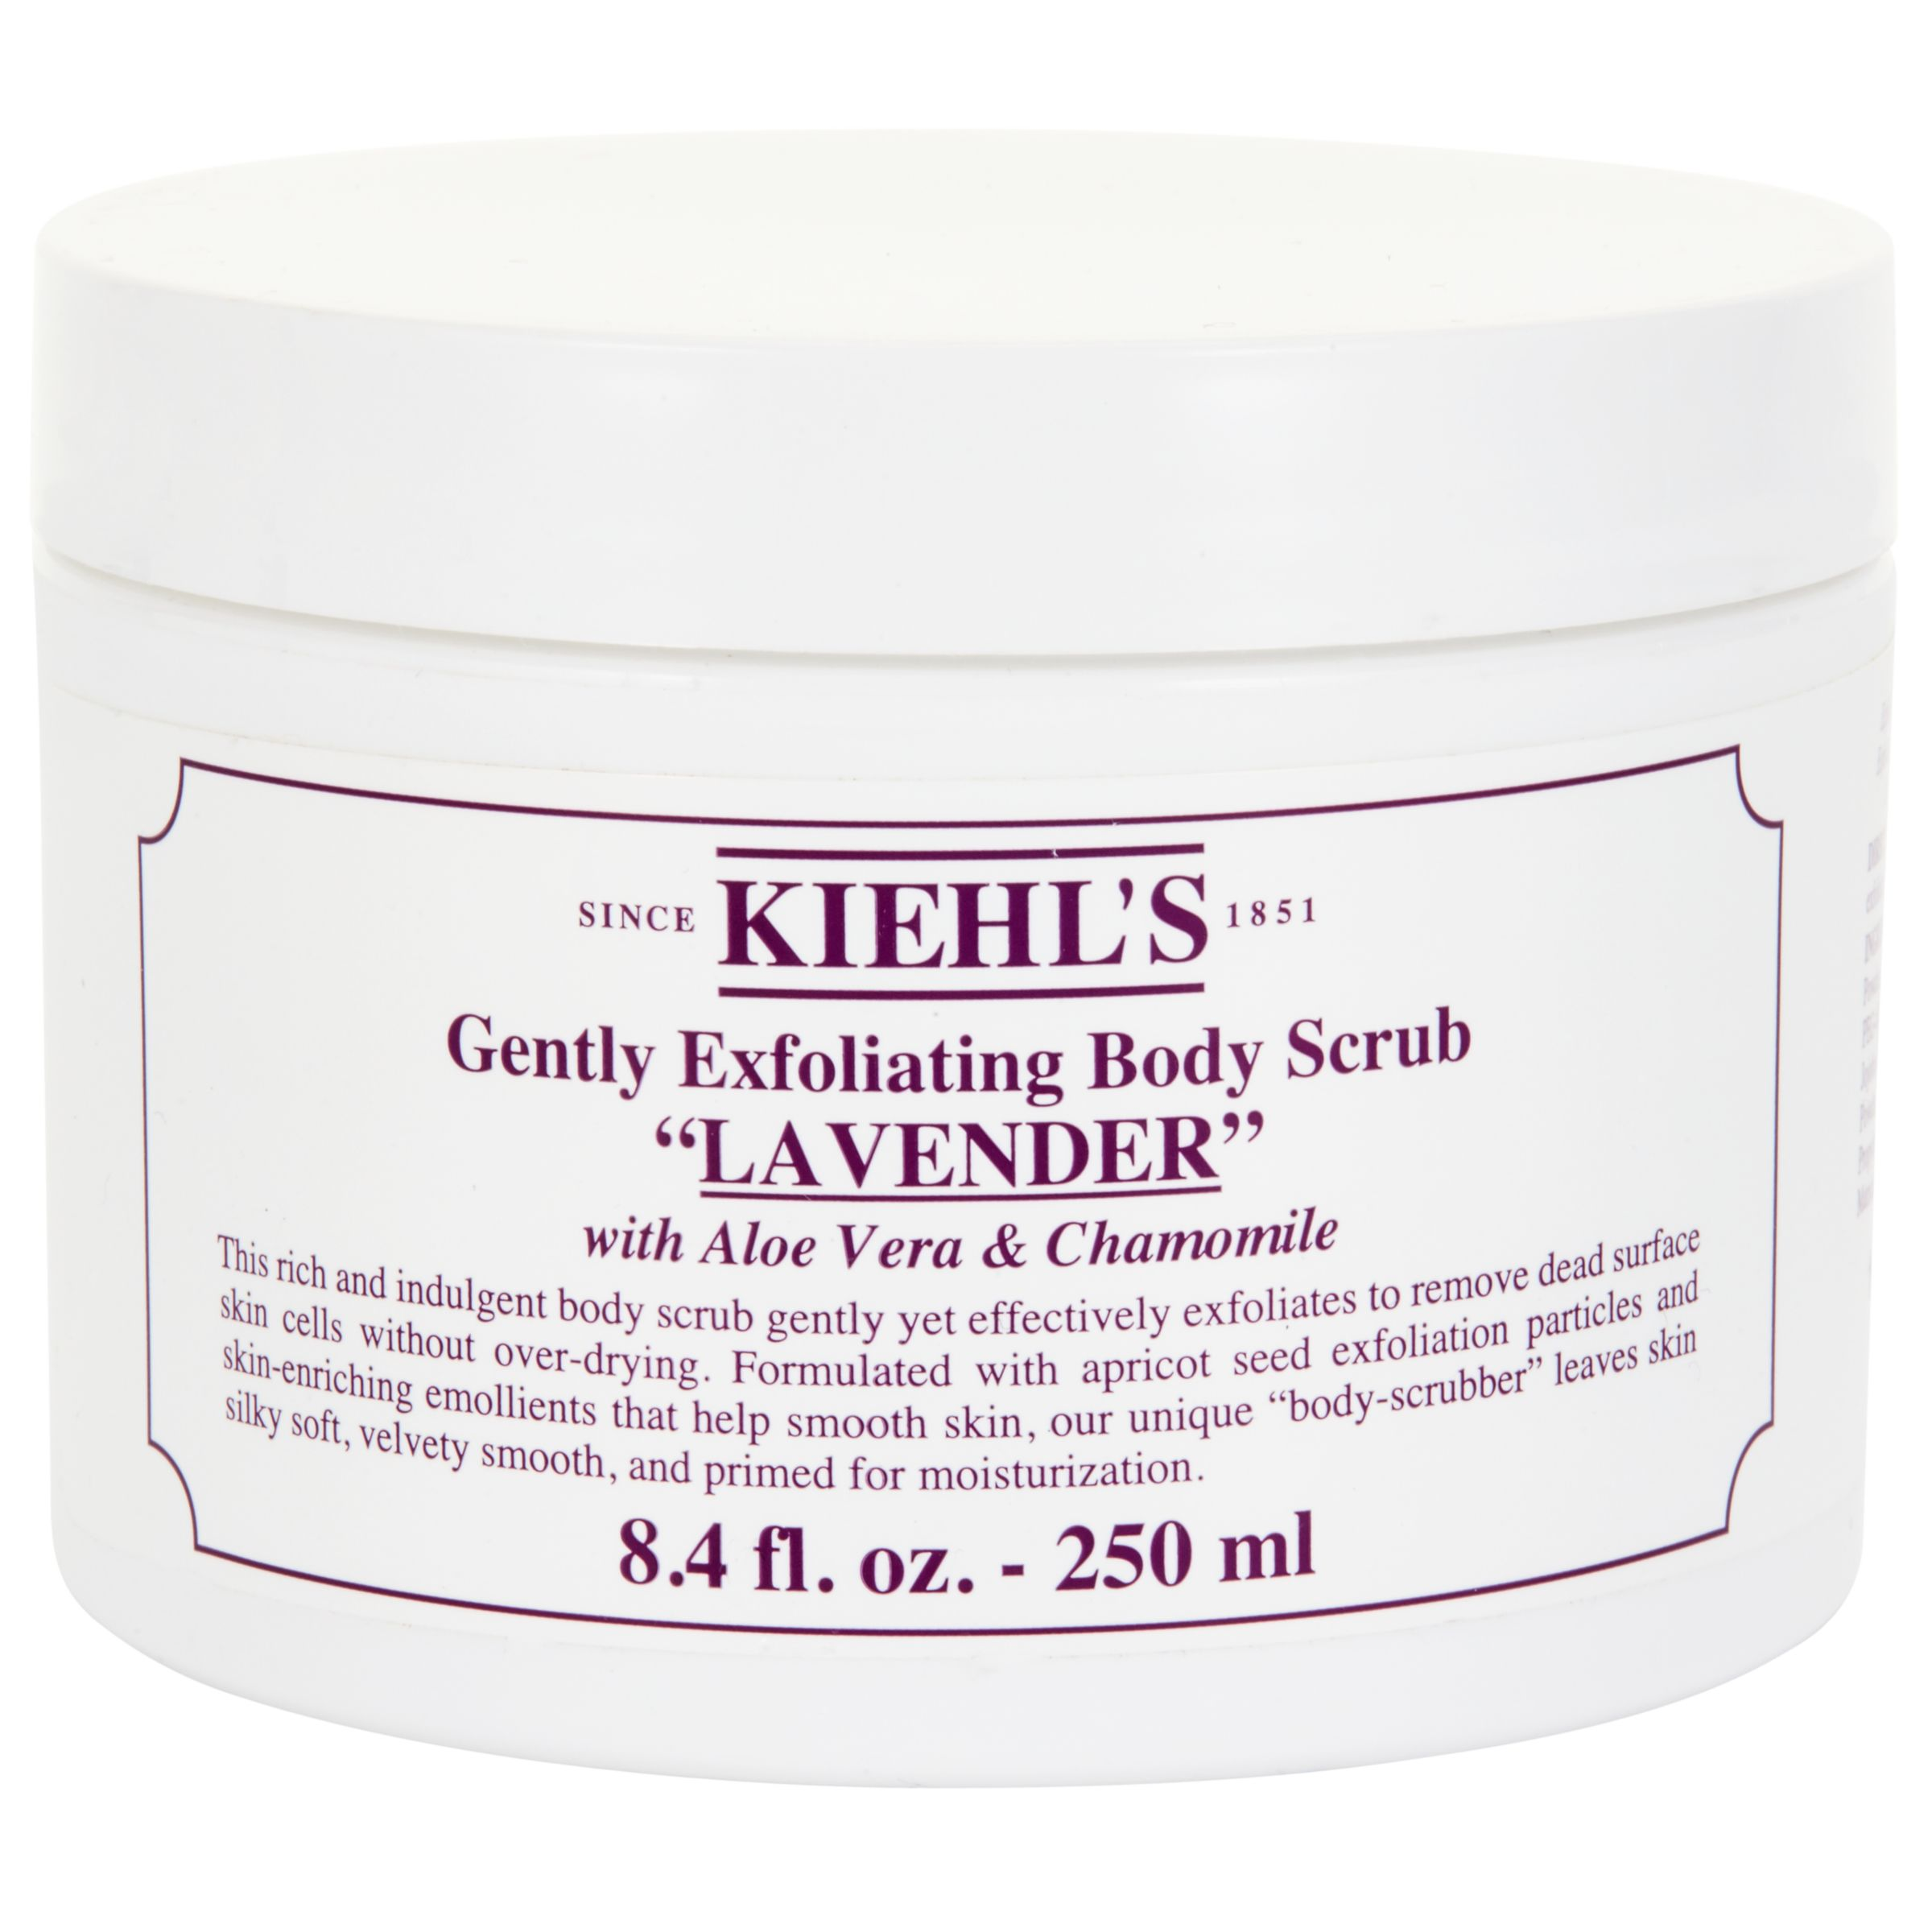 Kiehls Kiehl's Lavender Gently Exfoliating Body Scrub, 250ml